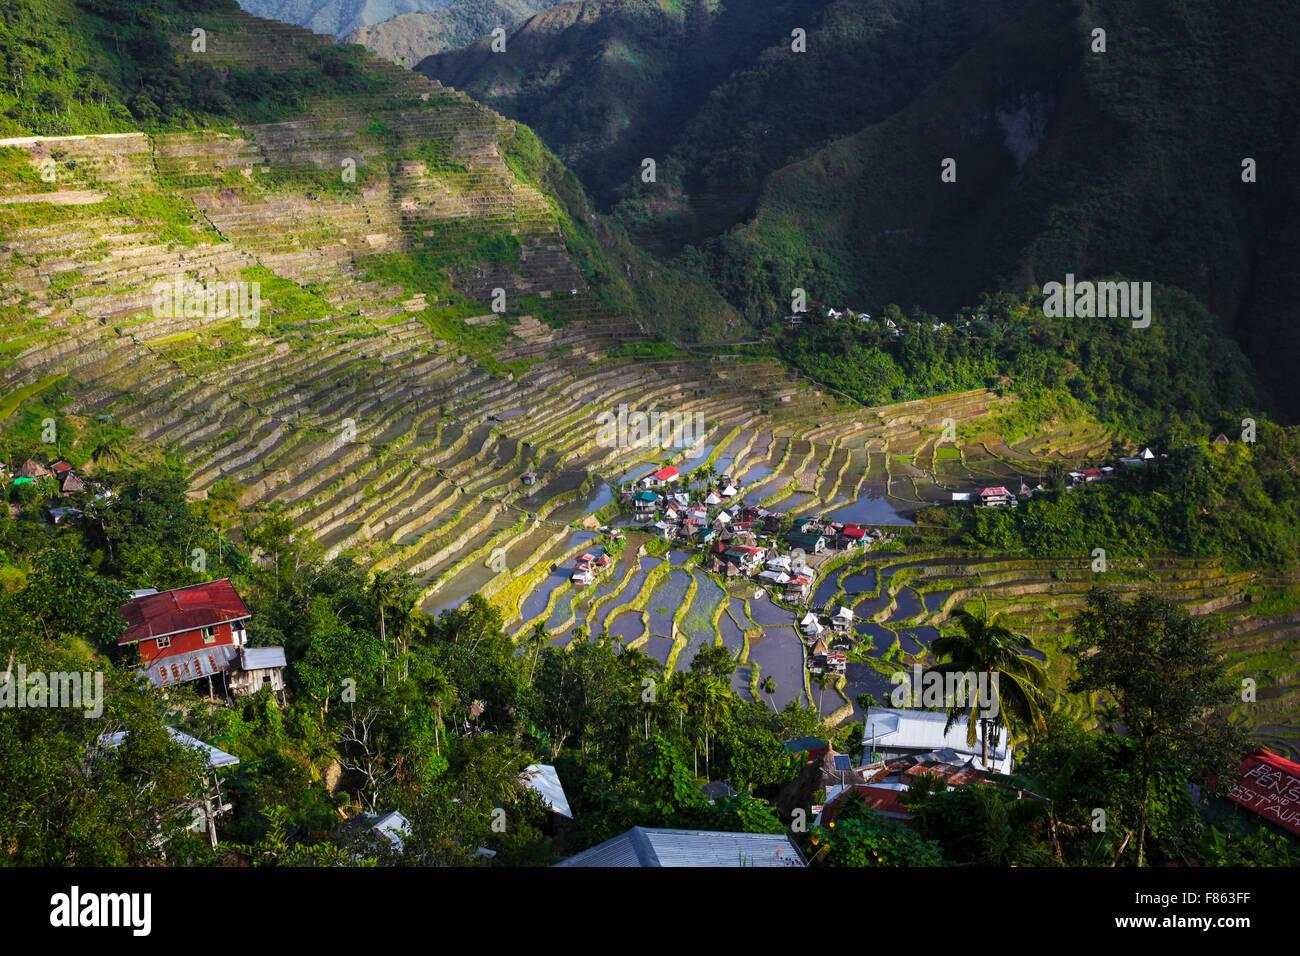 UNESCO rice terraces Batad/Banaue Phlippines - Stock Image